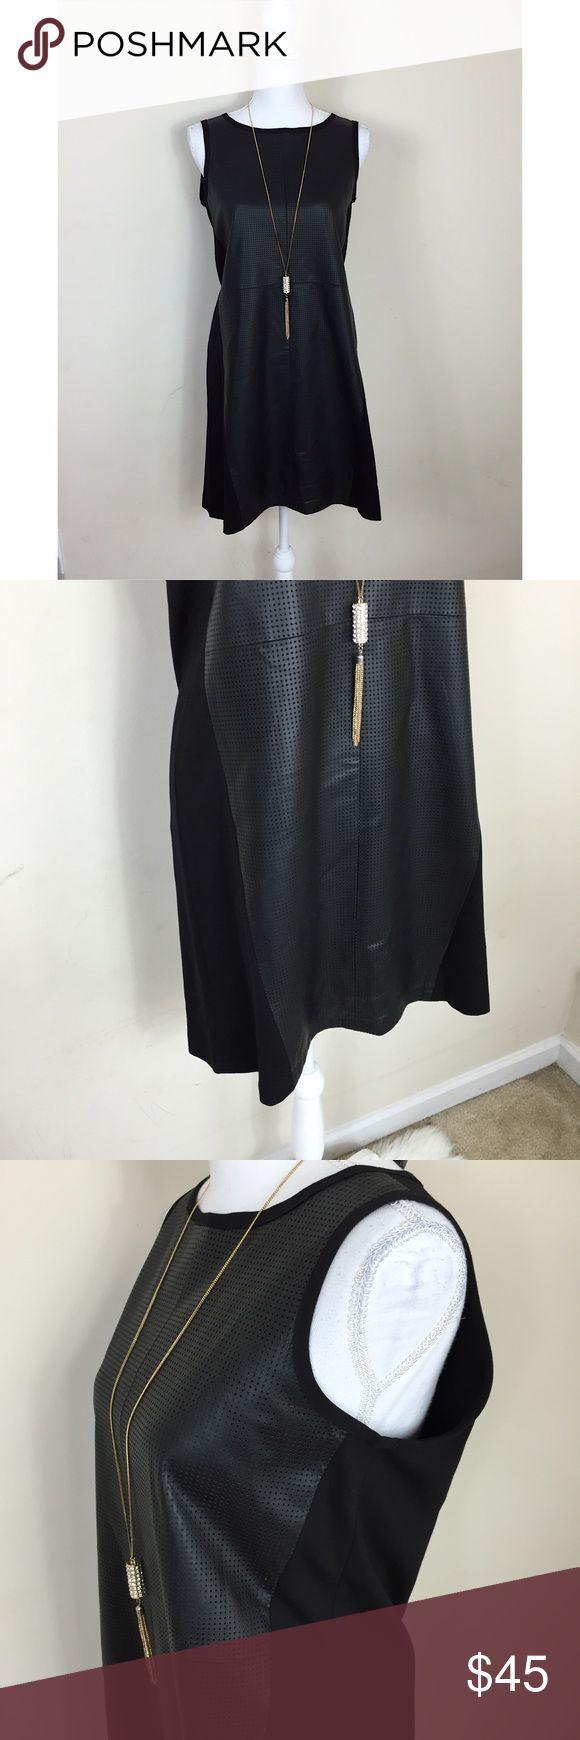 {Neiman Marcus} Genuine Leather Dress Neiman Marcus size medium. Genuine leather textured front. EUC. Zips up back. Neiman Marcus Dresses Mini